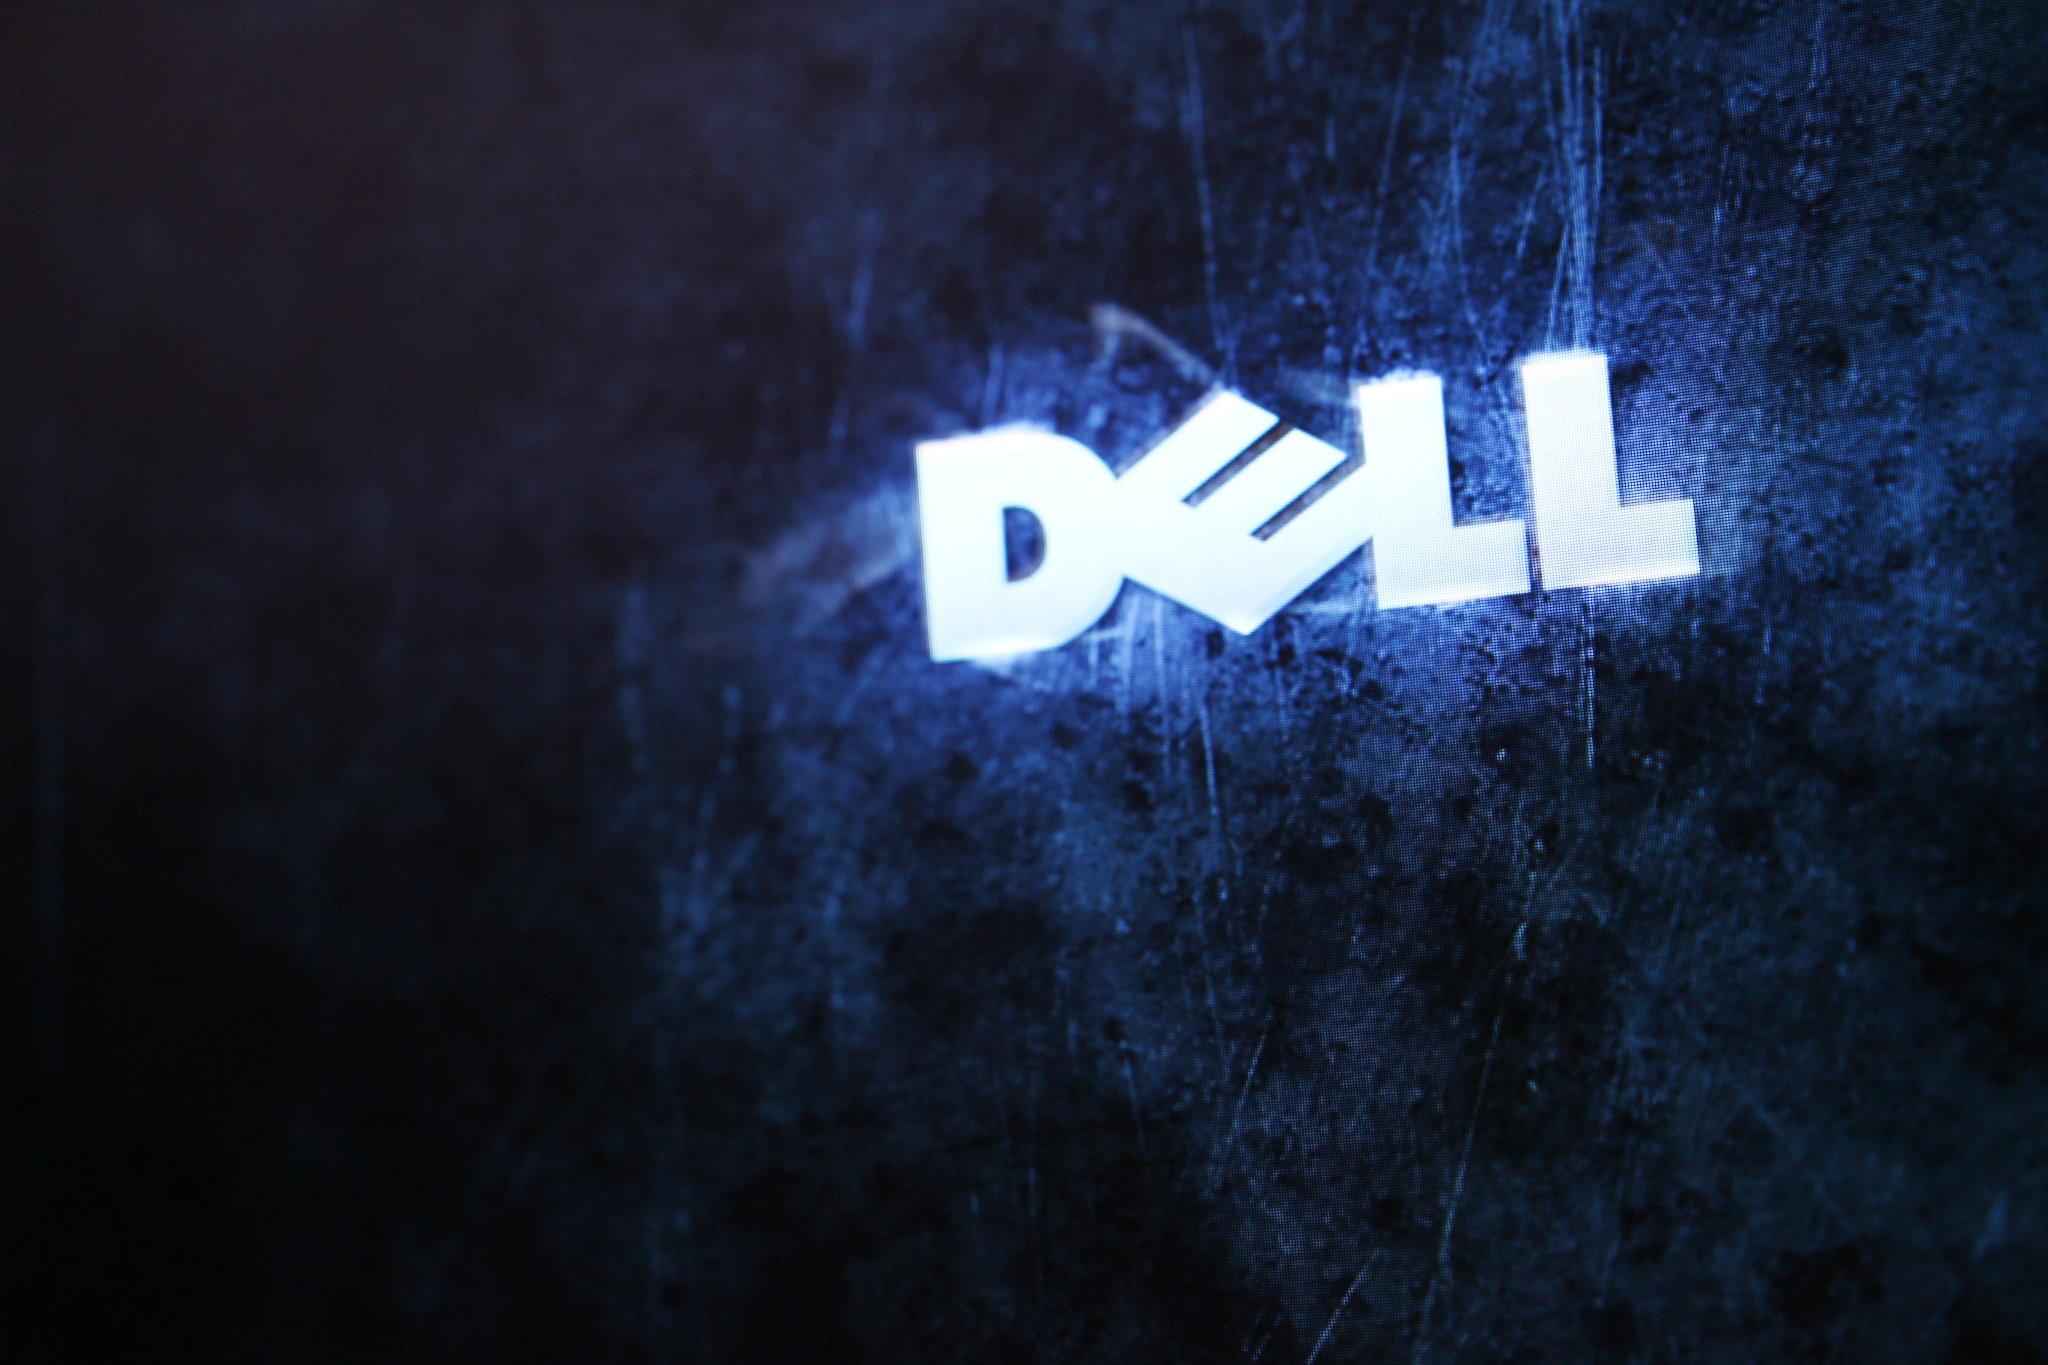 Dell Windows 7 Desktop Wallpaper 63 Images